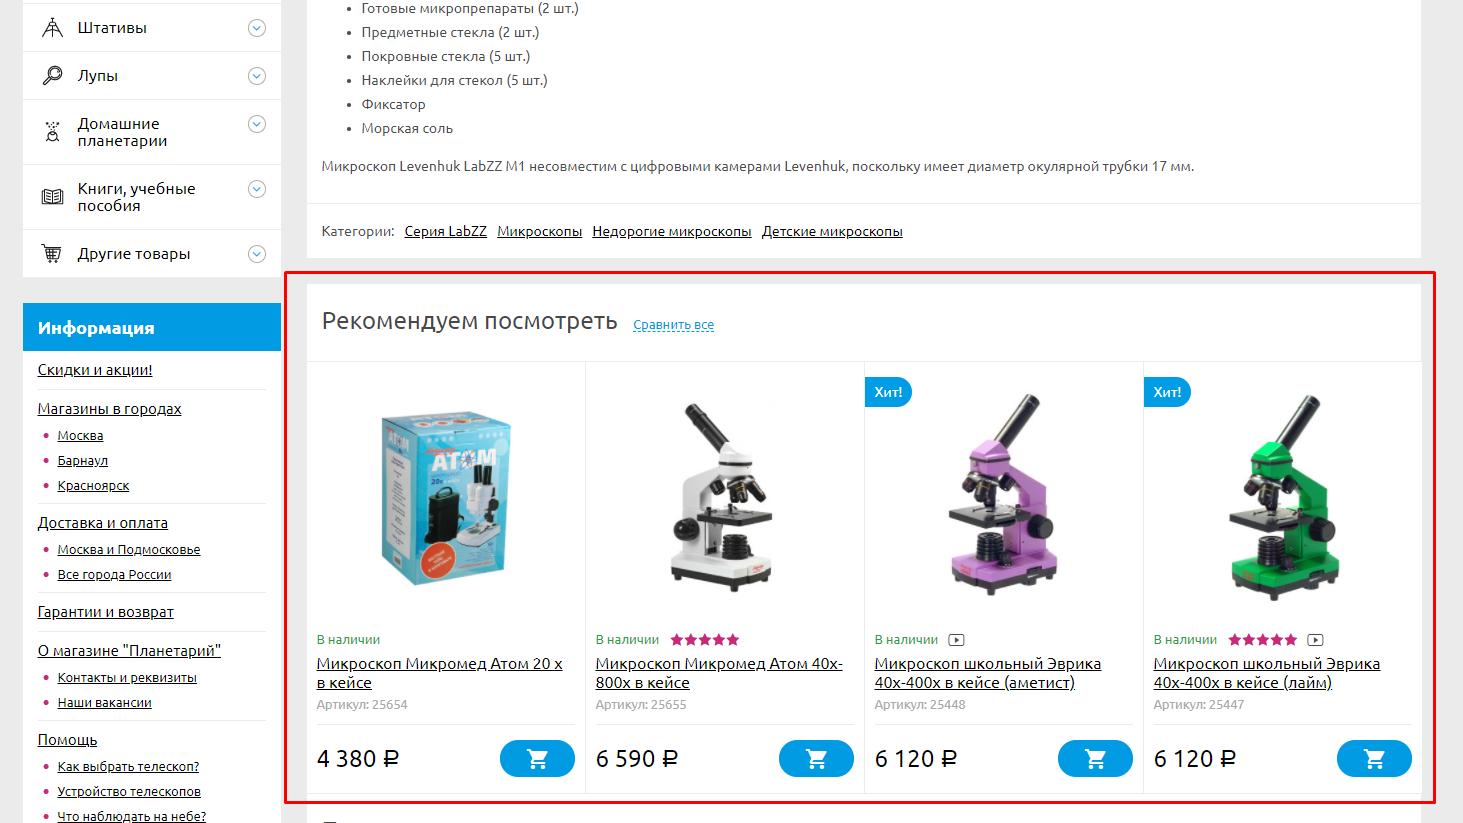 Апселлинг в Планетариум.ру